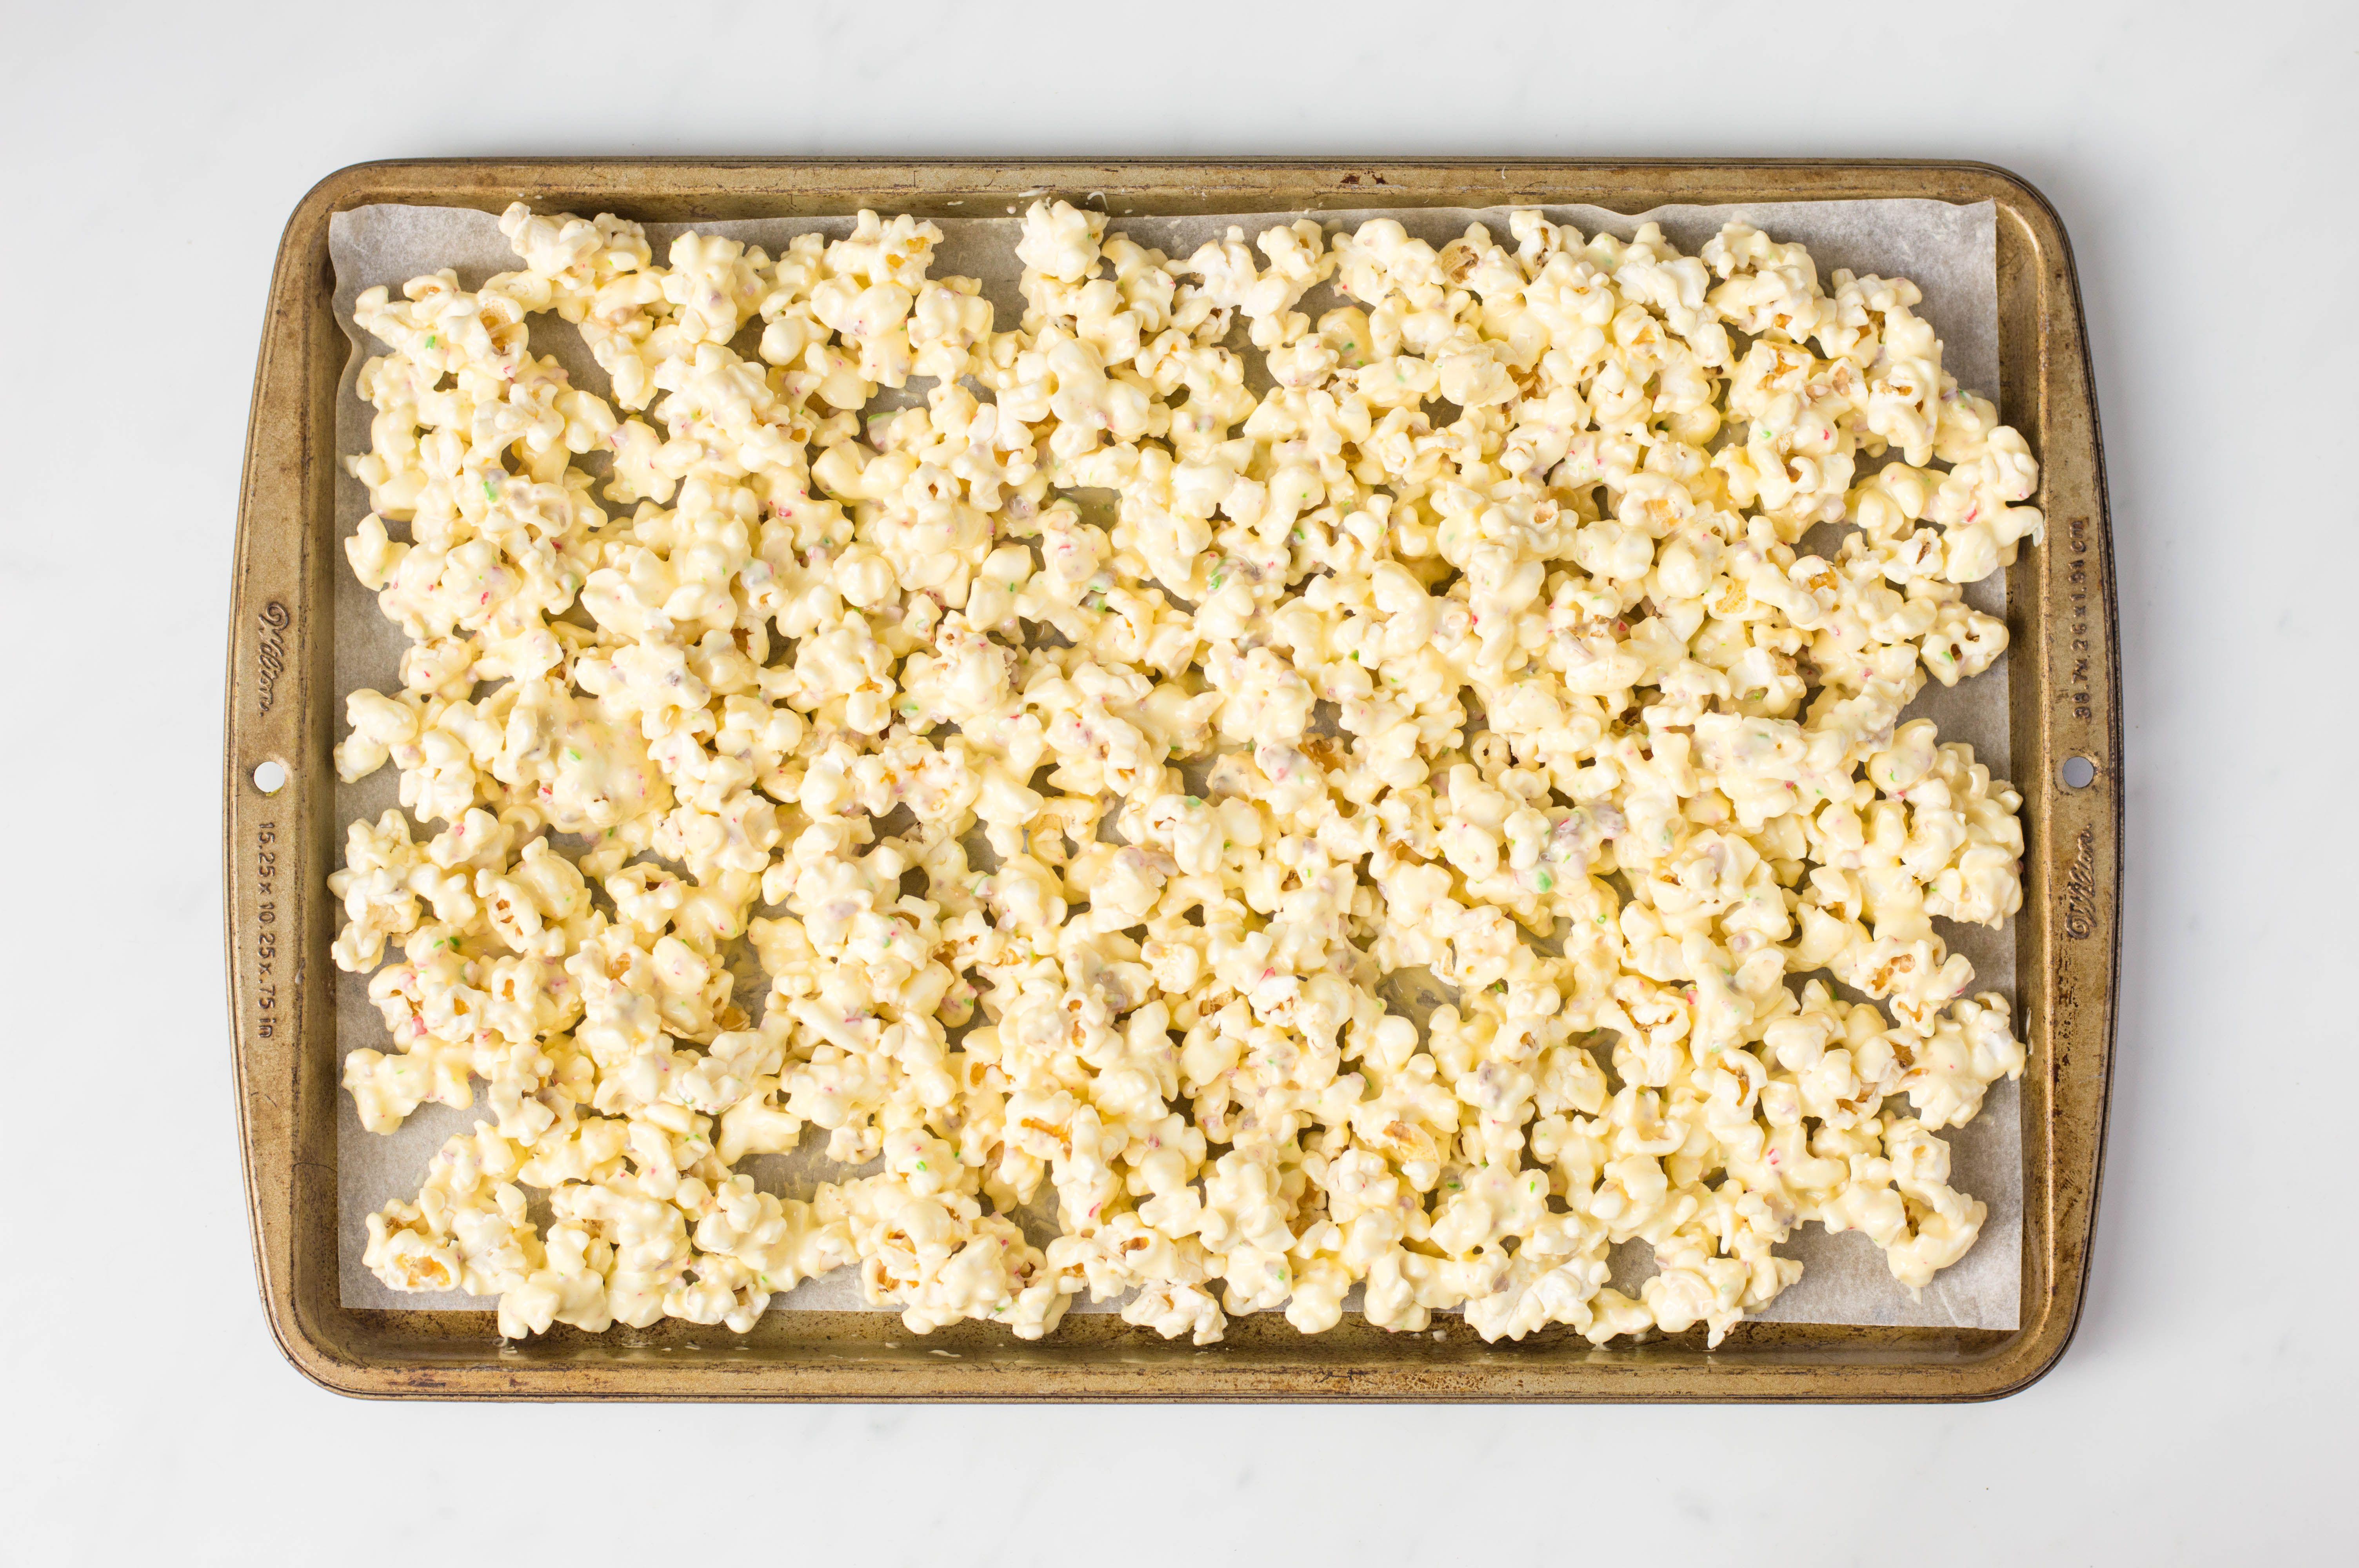 Popcorn on baking tray